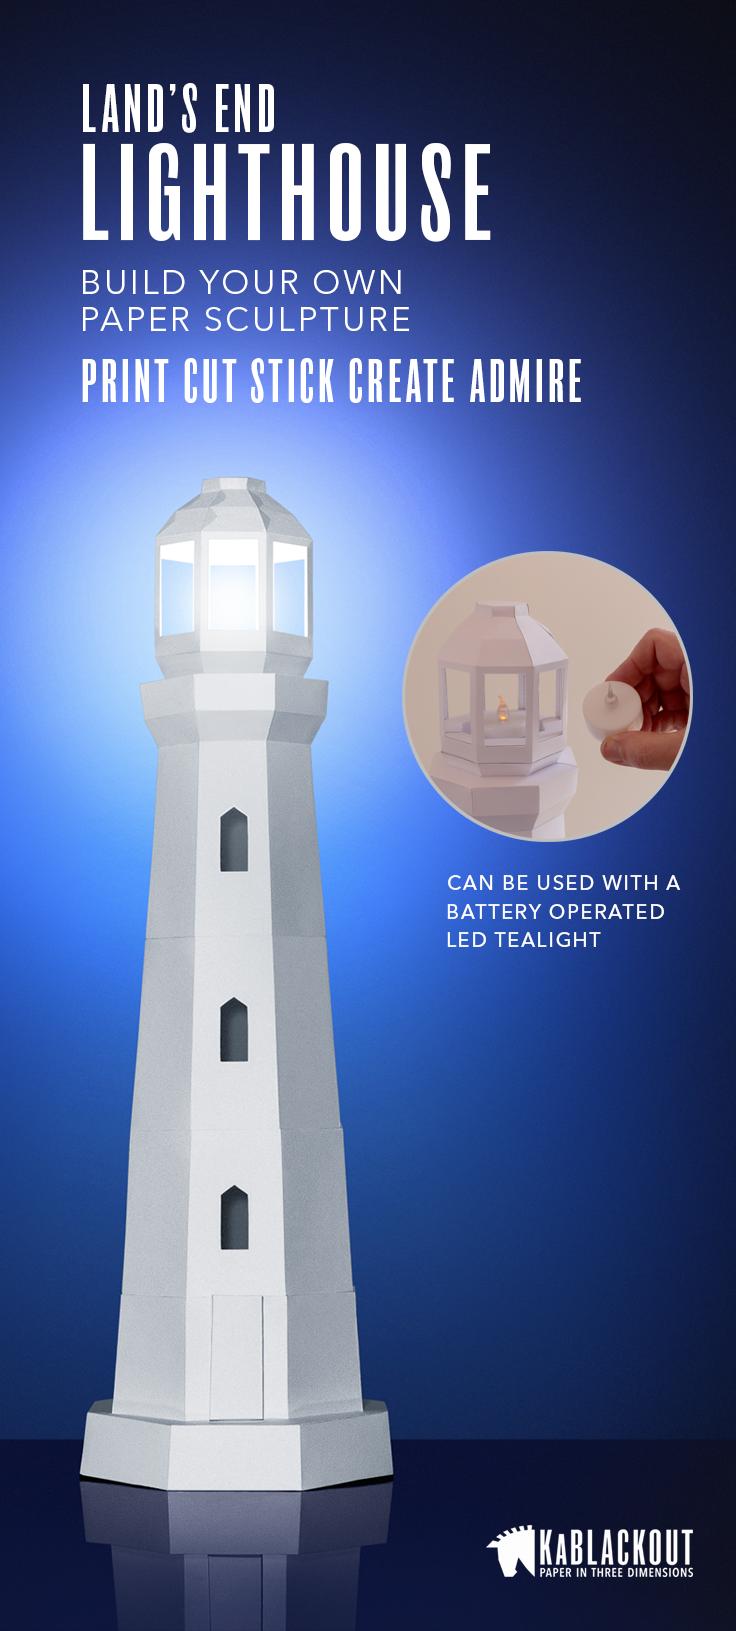 Lighthouse papercraft low poly lighthouse template diy for 3d paper lighthouse template